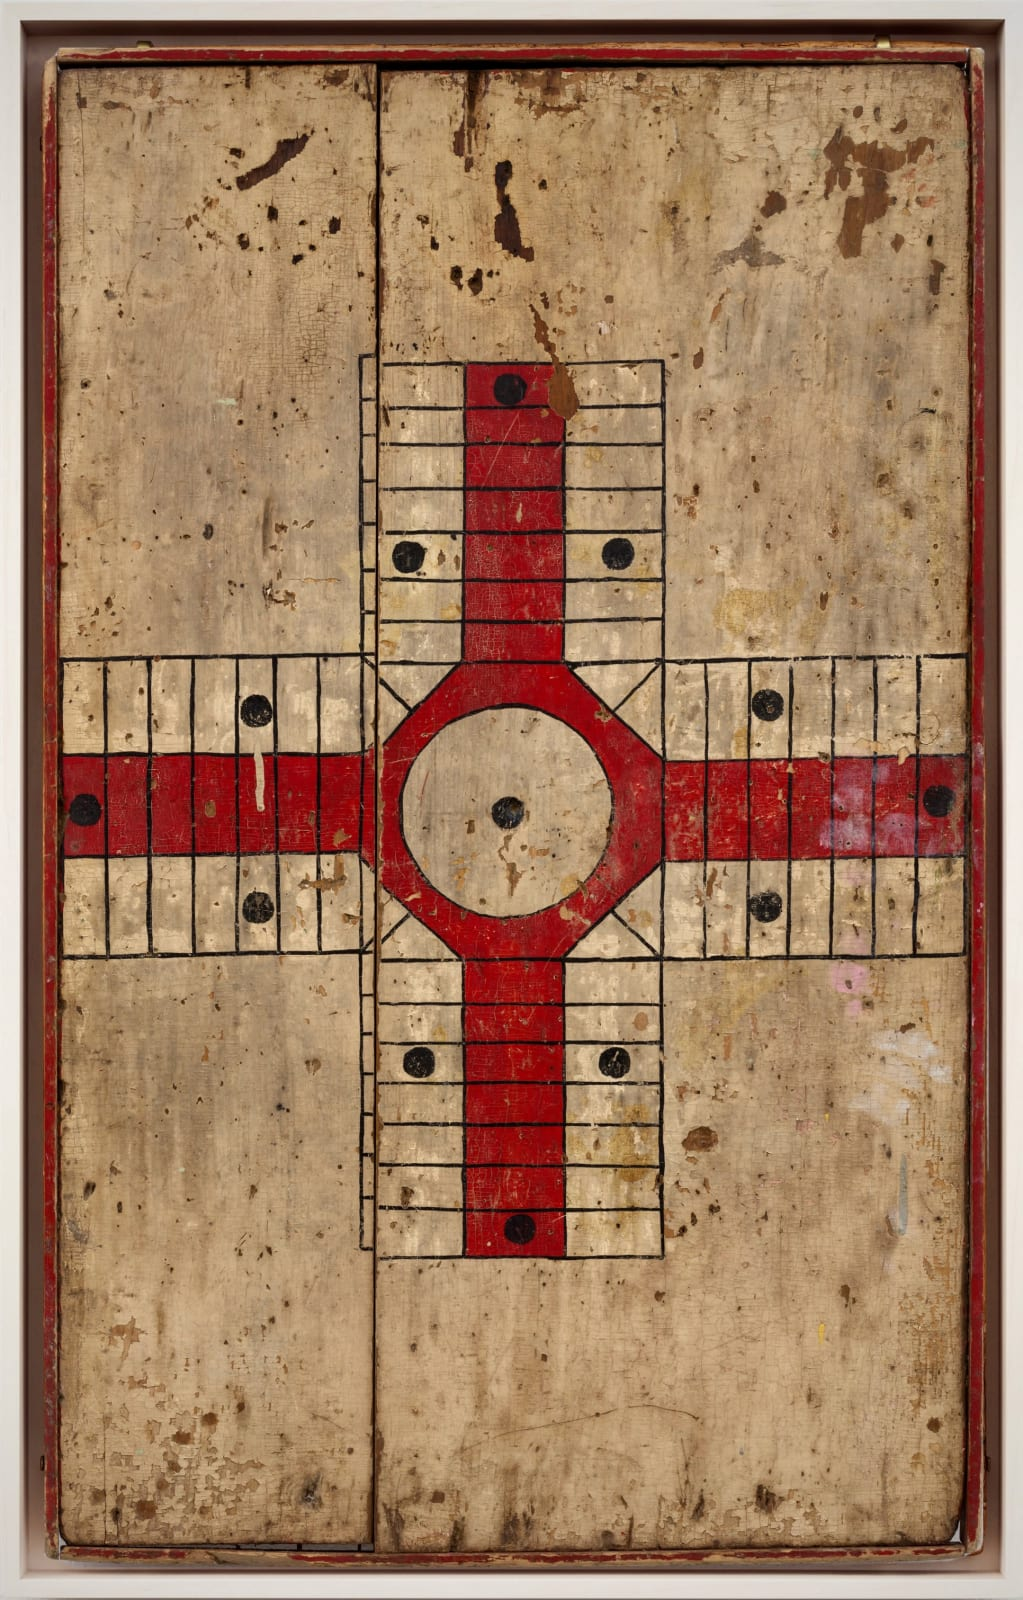 PARCHEESI GAME BOARD, EARLY 20TH CENTURY Oil enamel on wood panel 31 x 19 in. 78.7 x 48.3 cm. (AU 285)